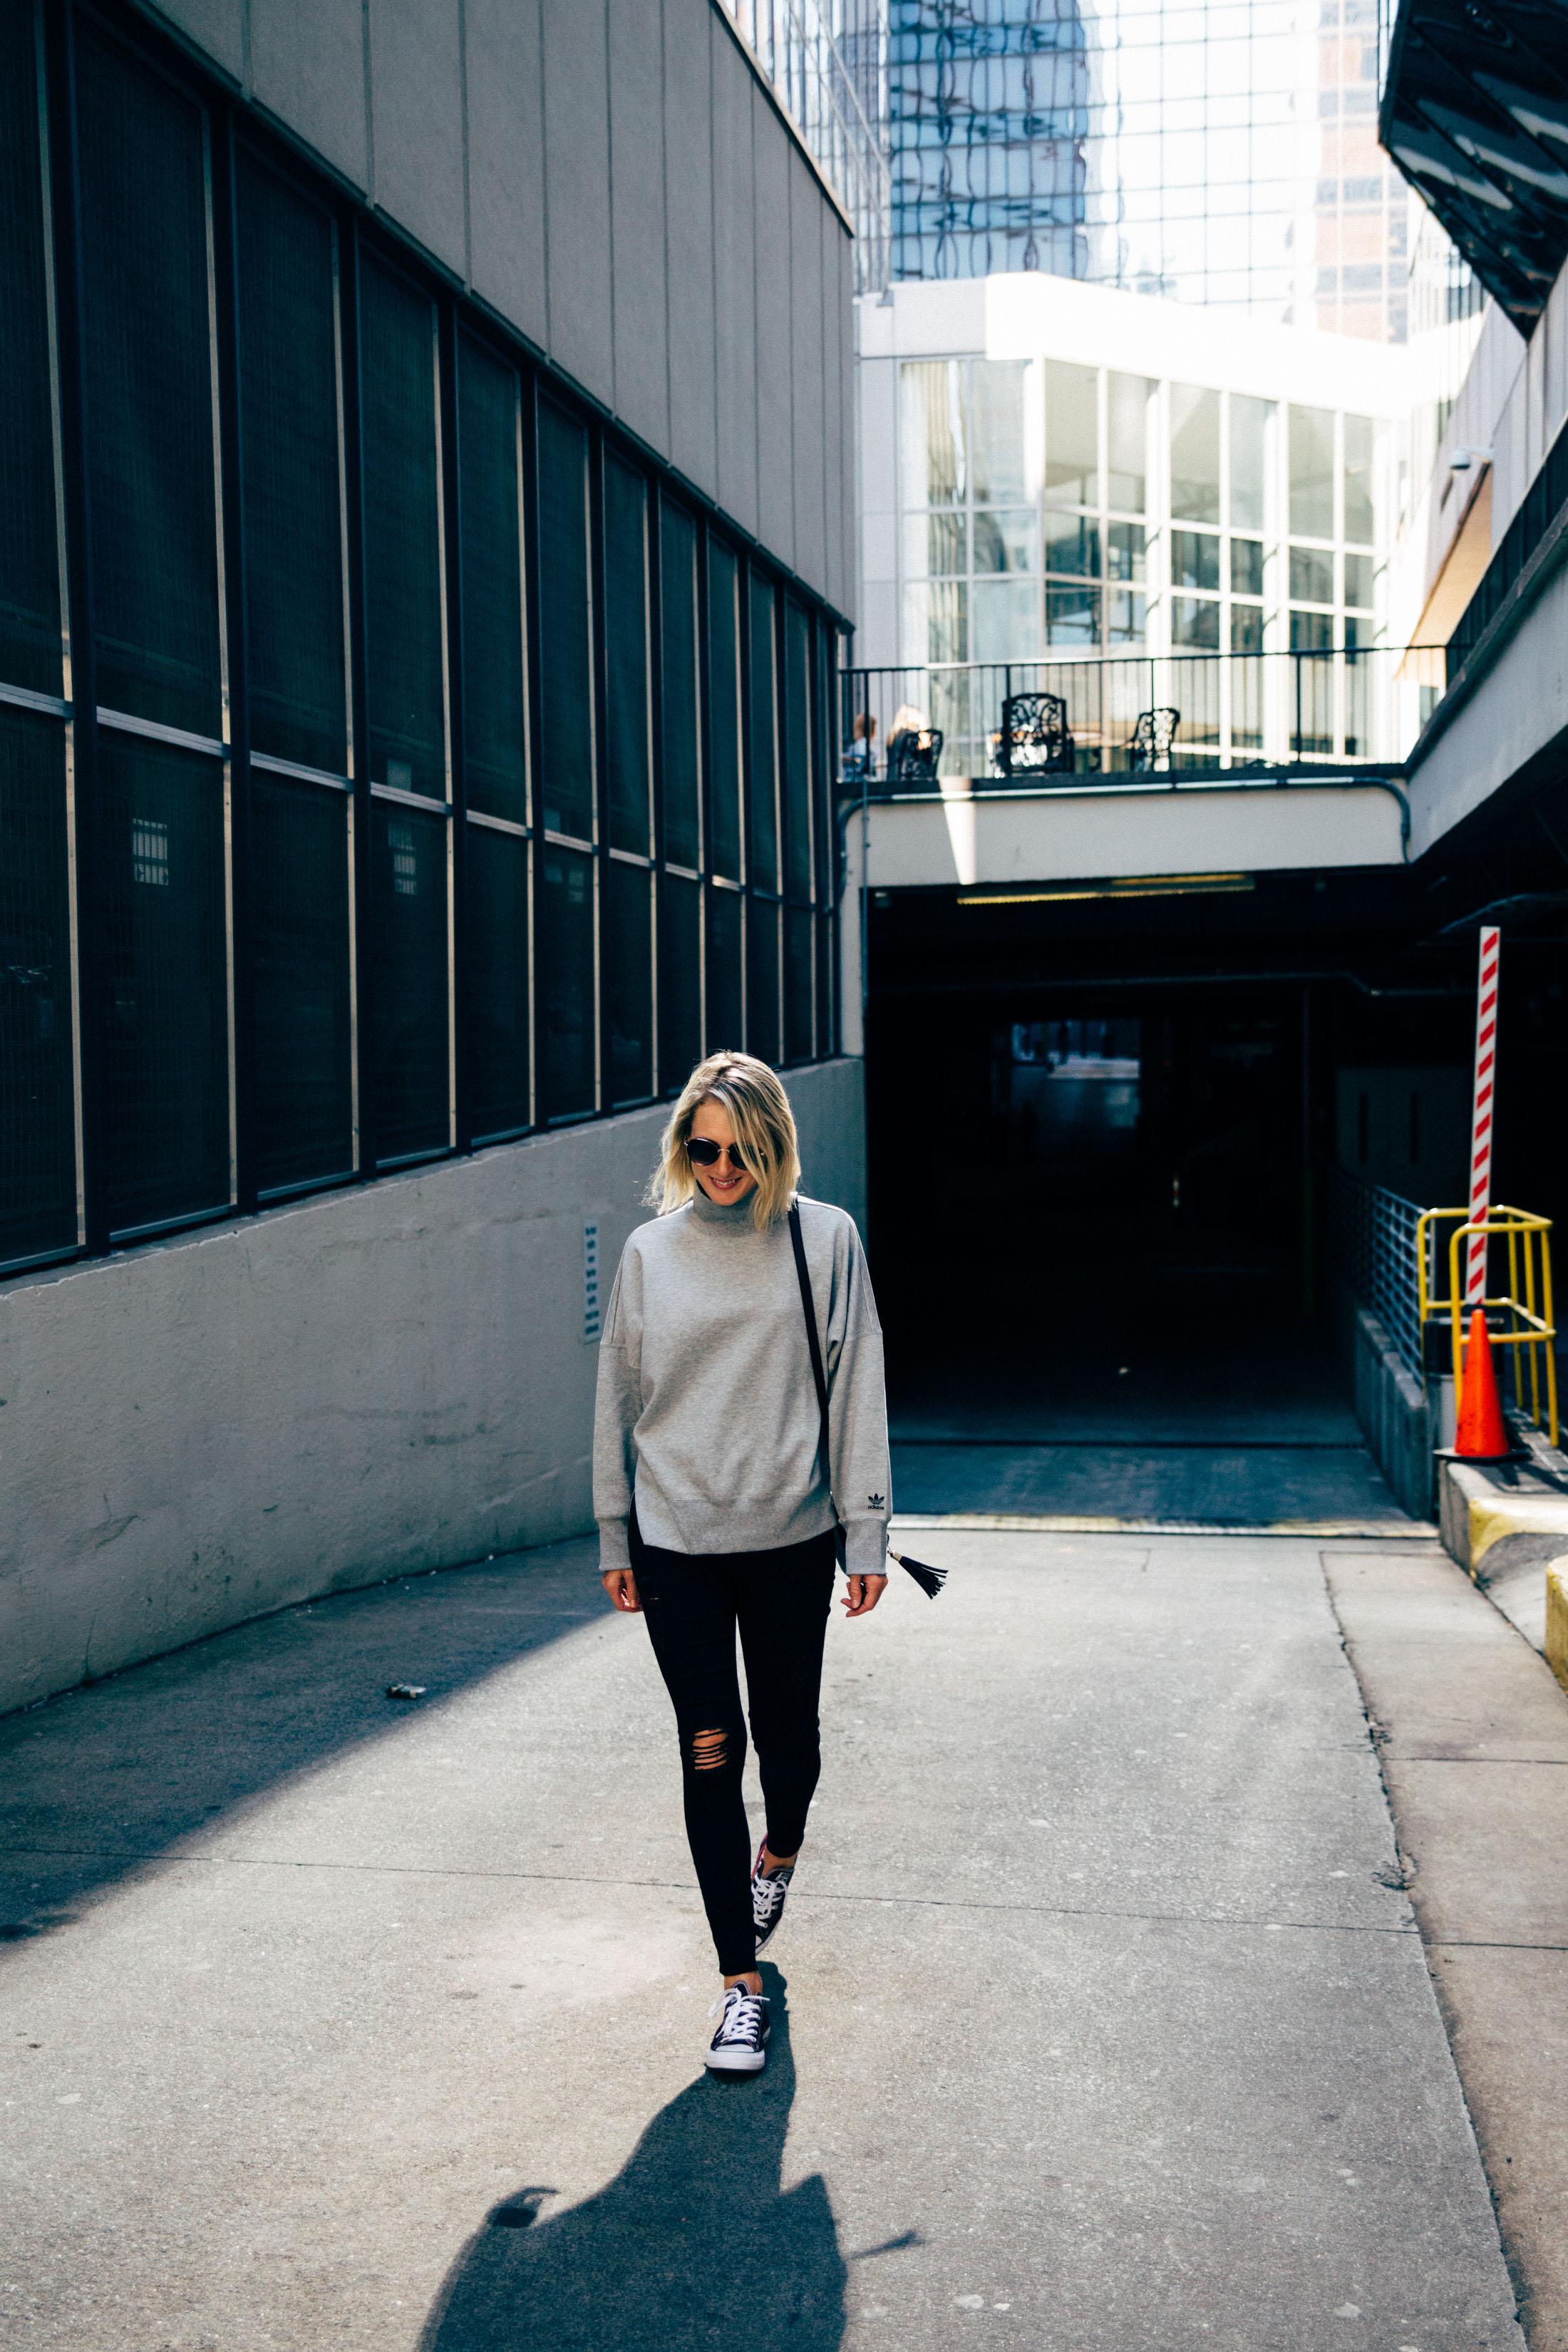 sweatshirt and black jeans